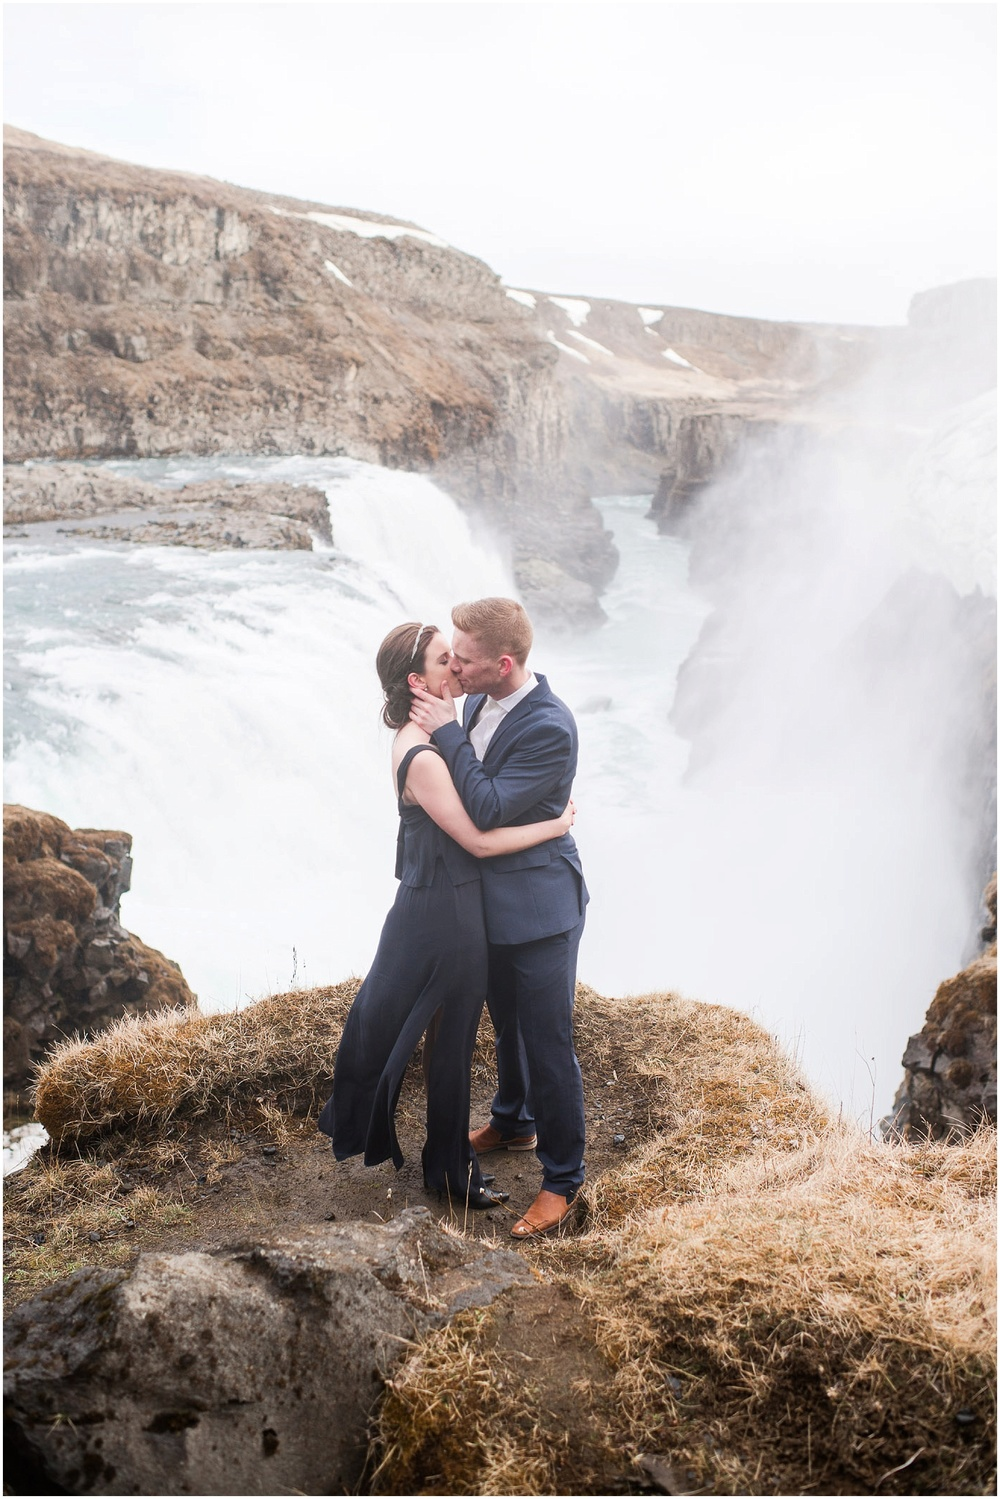 Hannah Leigh Photography Iceland Elopement Photographer_0136.jpg